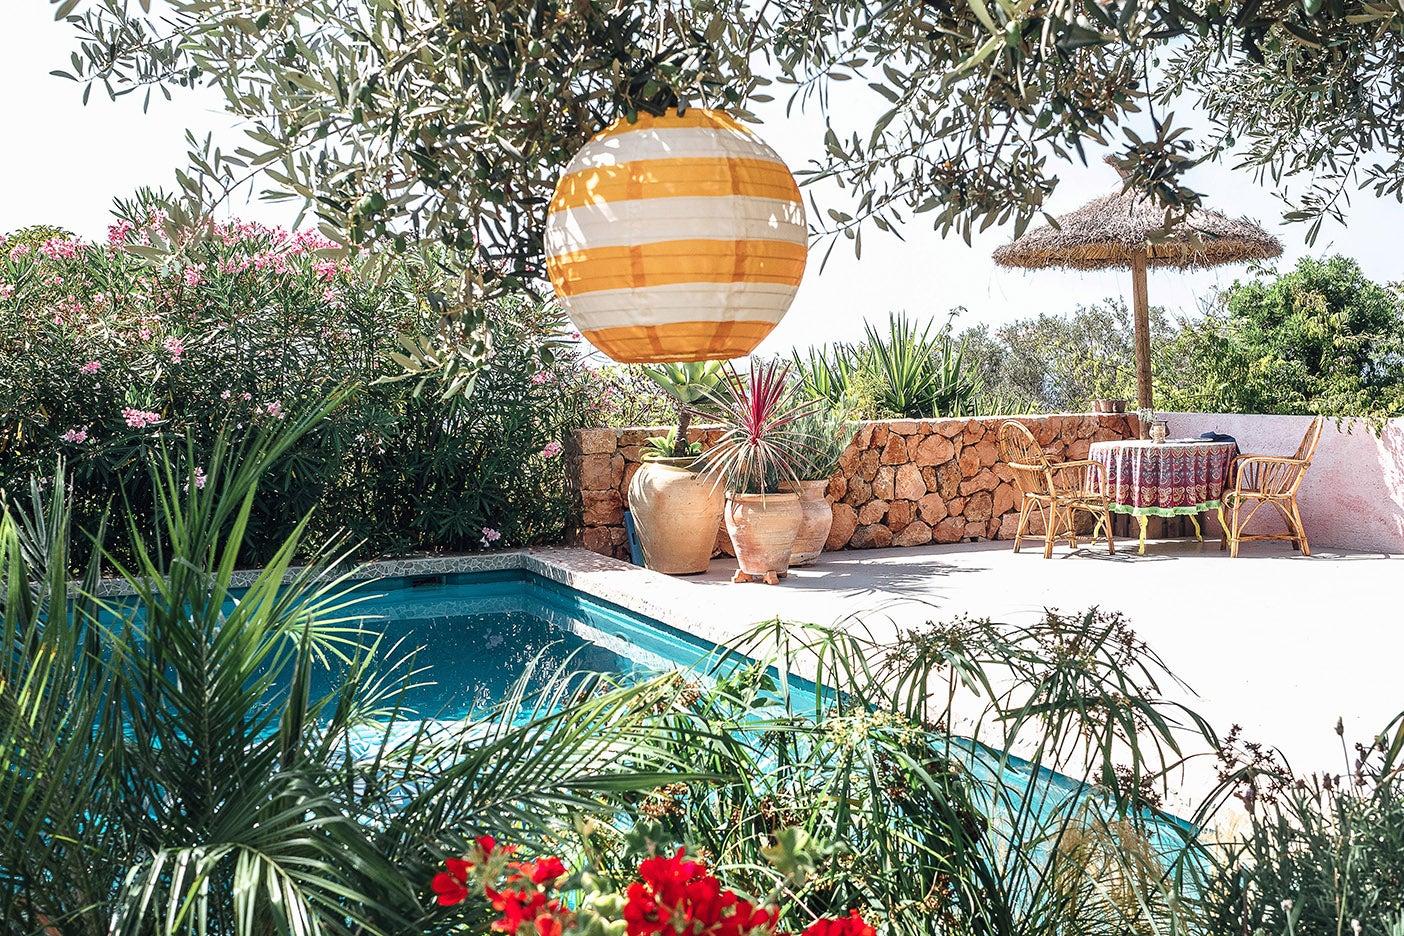 lantern over a pool